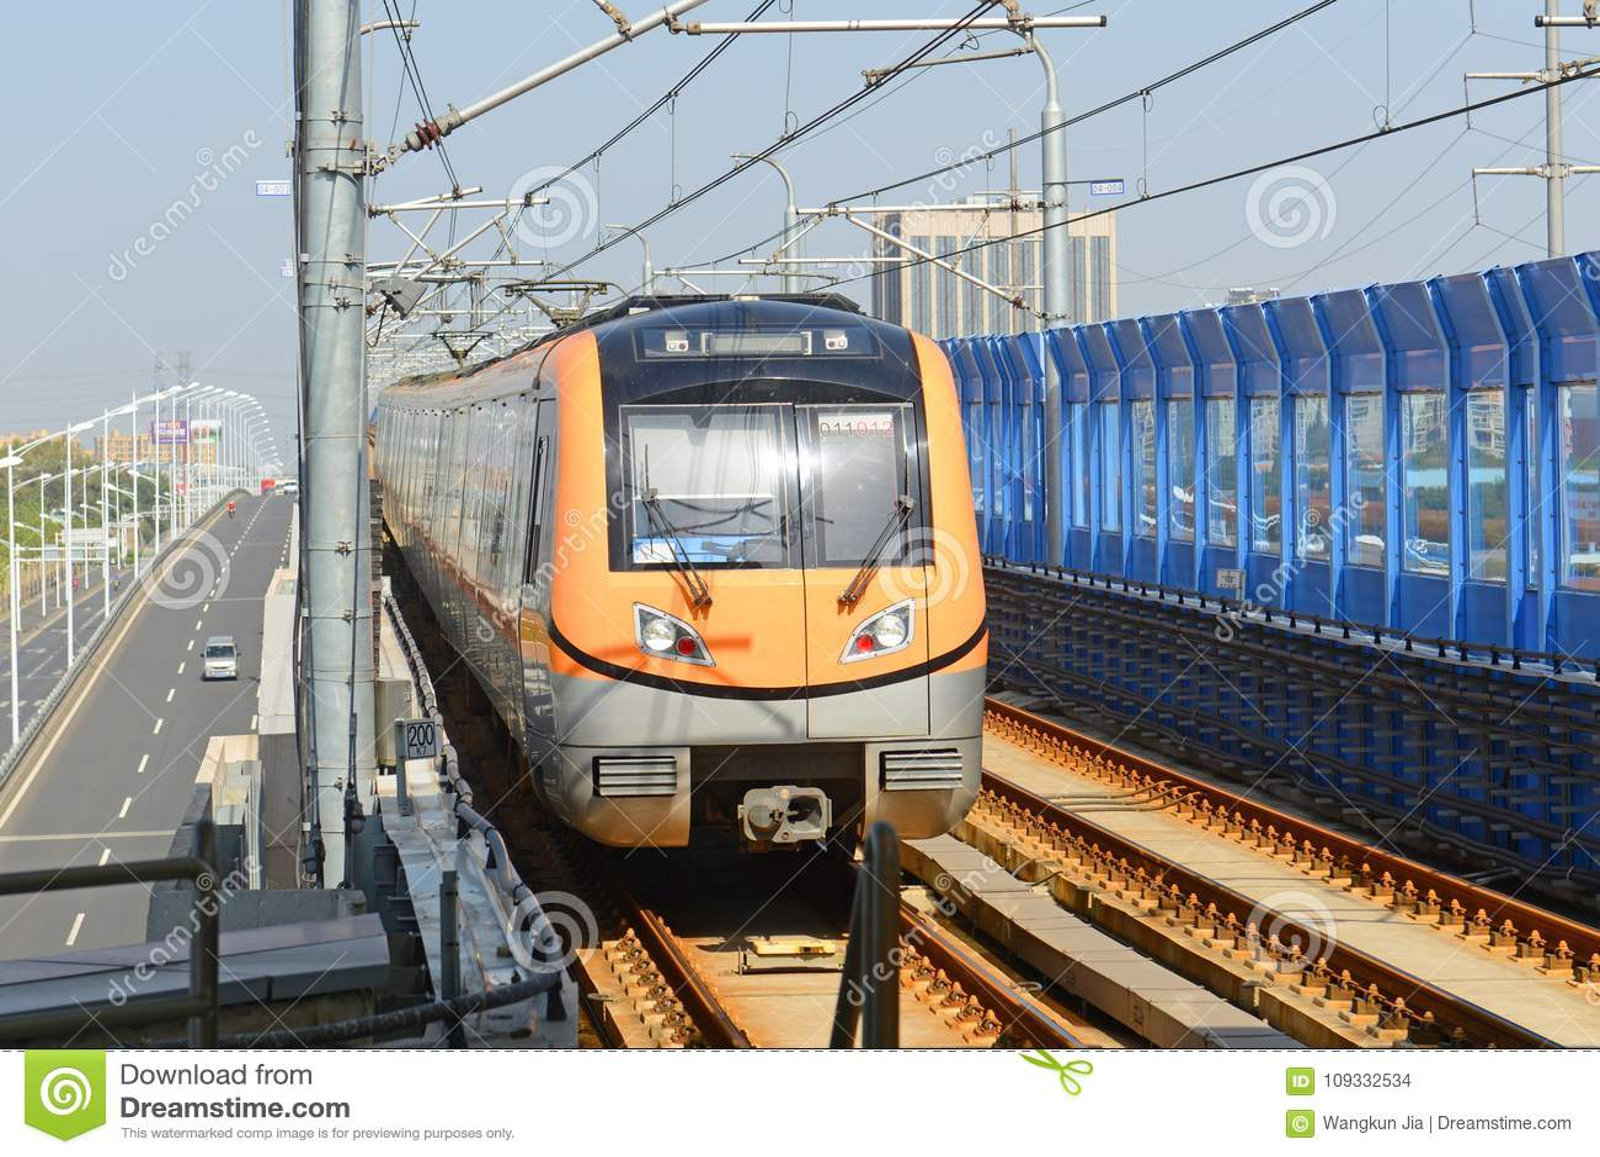 Nanjing City Metro Line S8, China Stock Photo - Image of